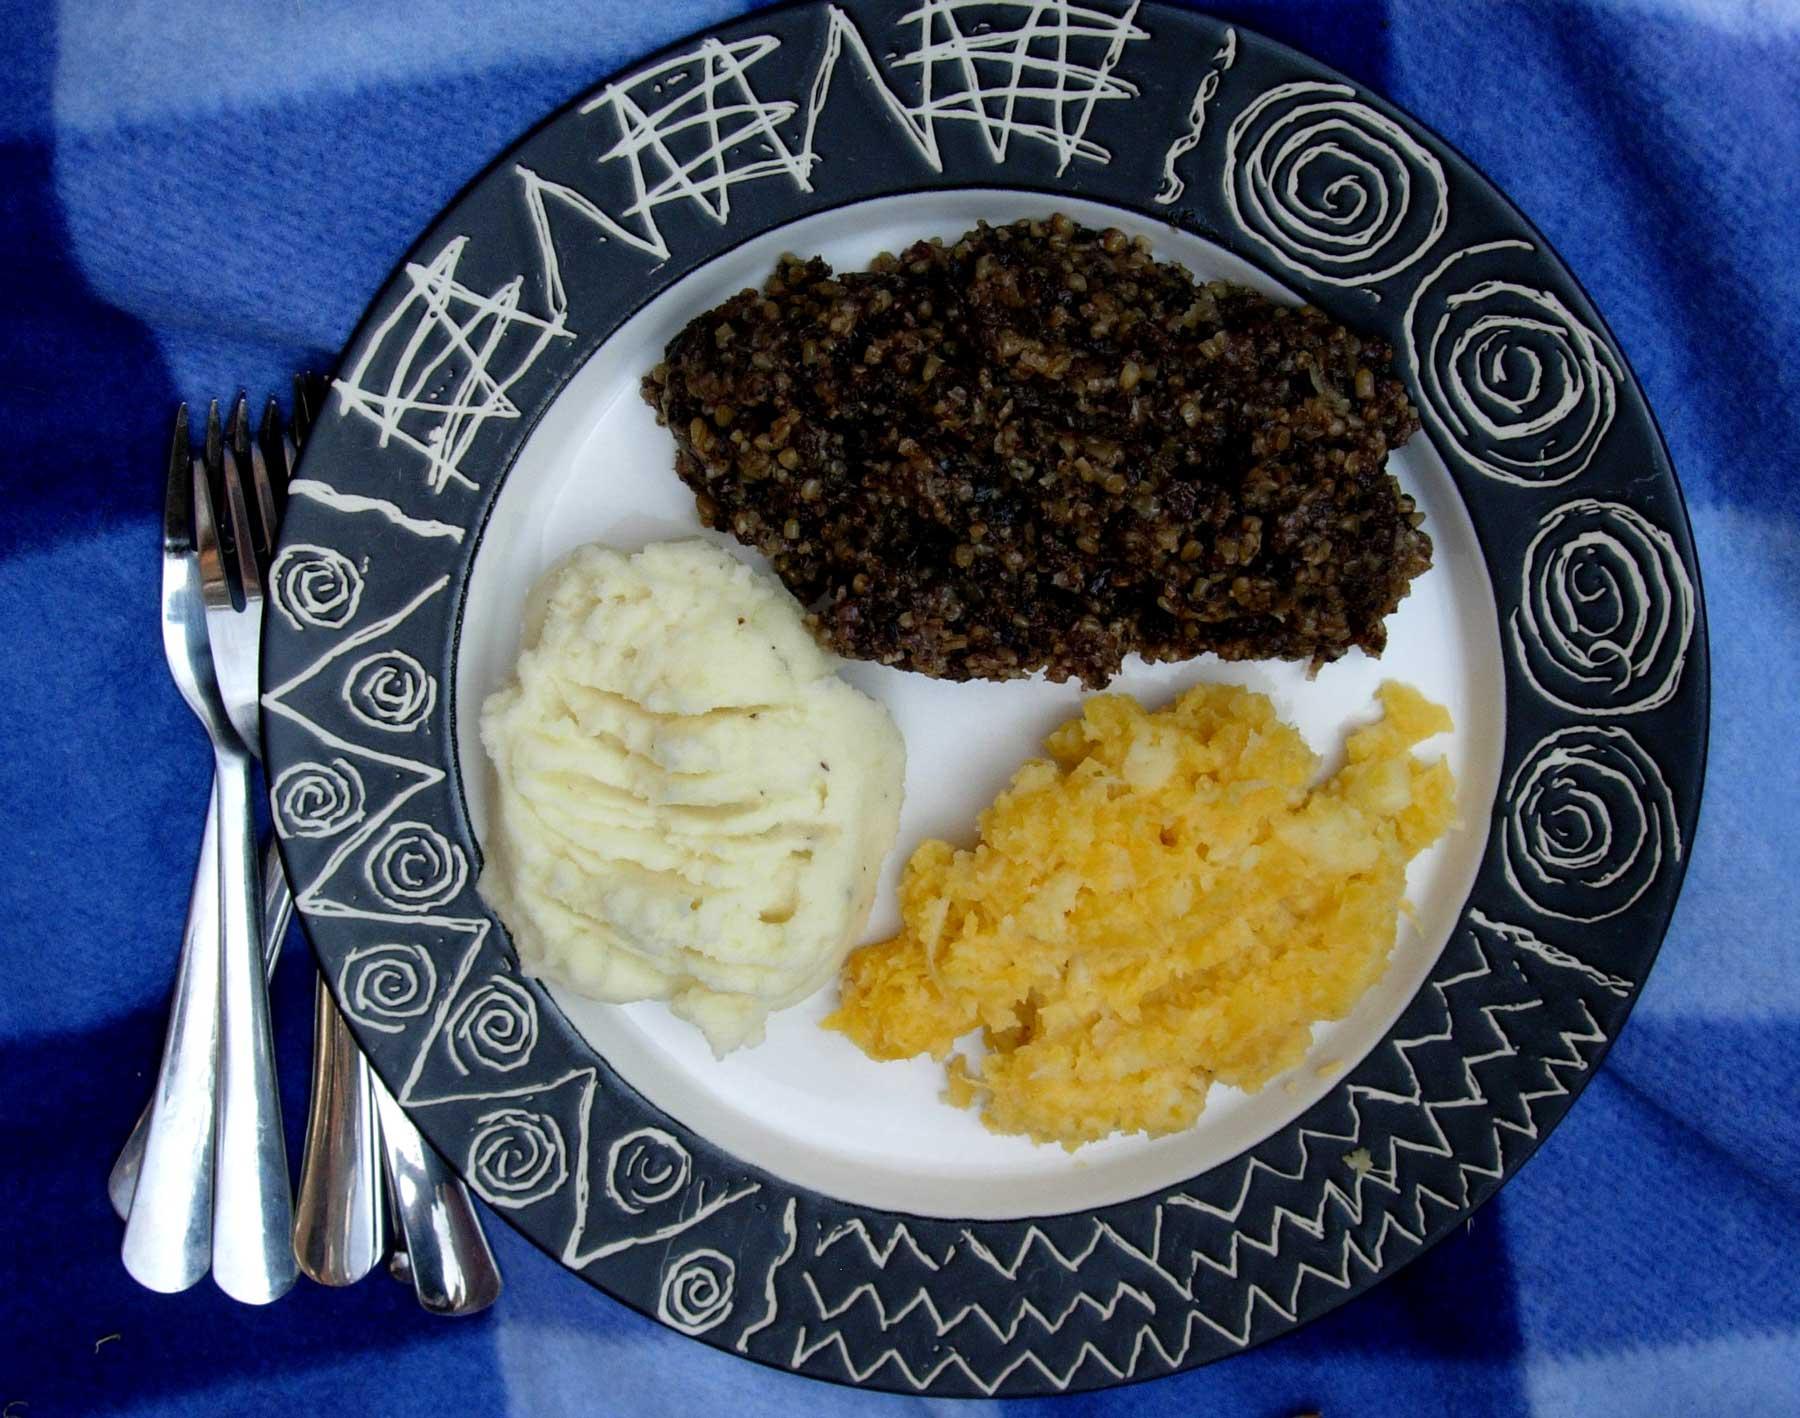 A typical haggis plate: Haggis, mashed potato, mashed turnip